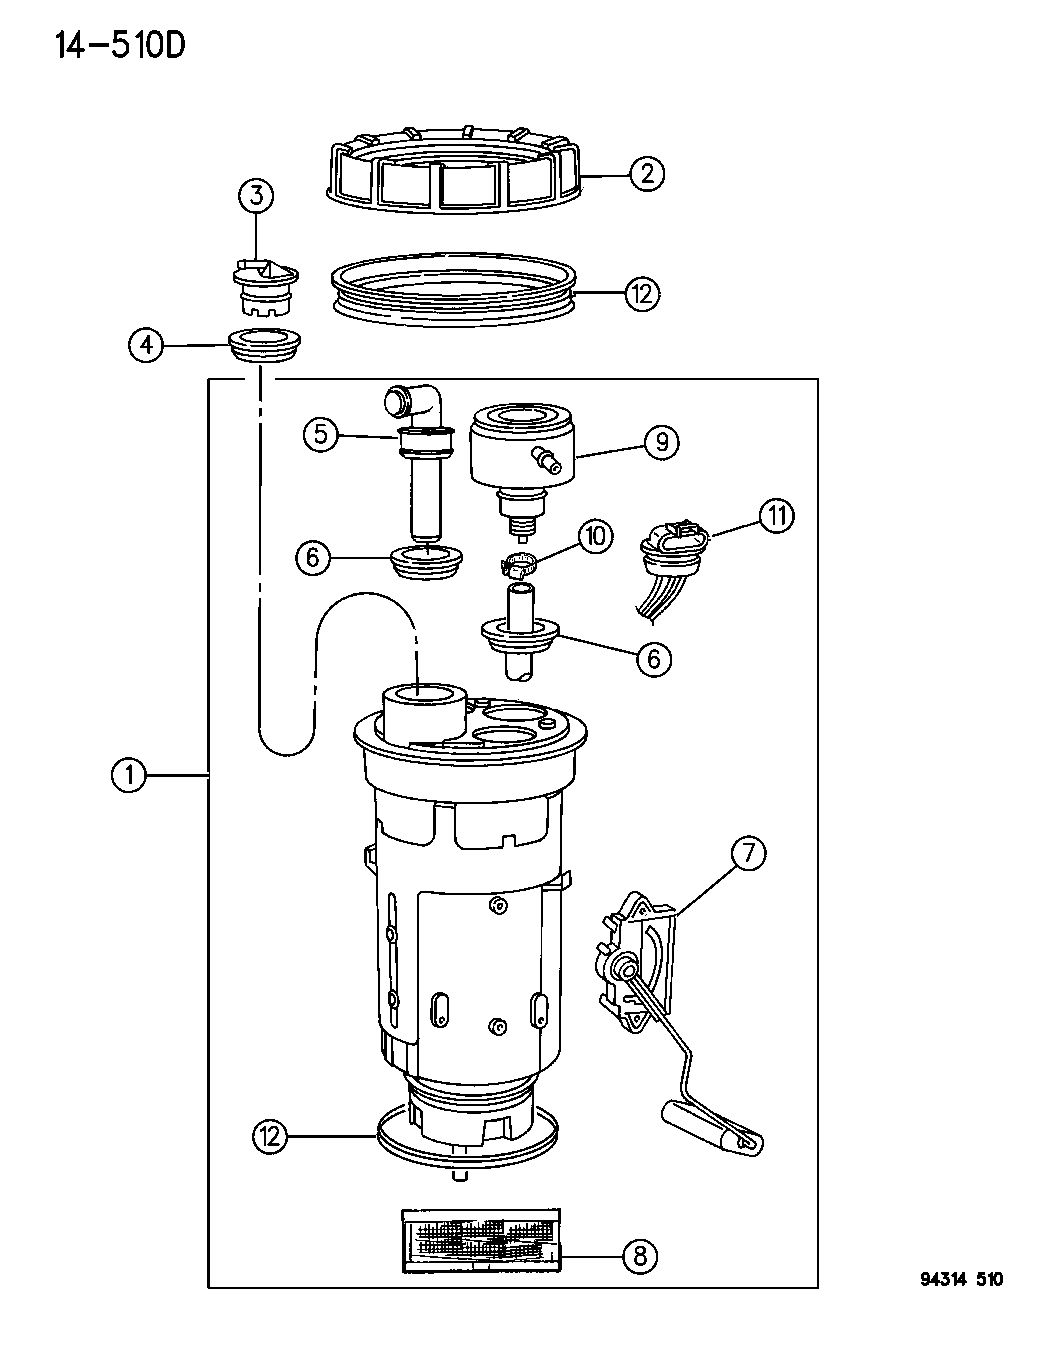 1996 dodge dakota fuel module, level unit and filter 1995 Dodge Dakota